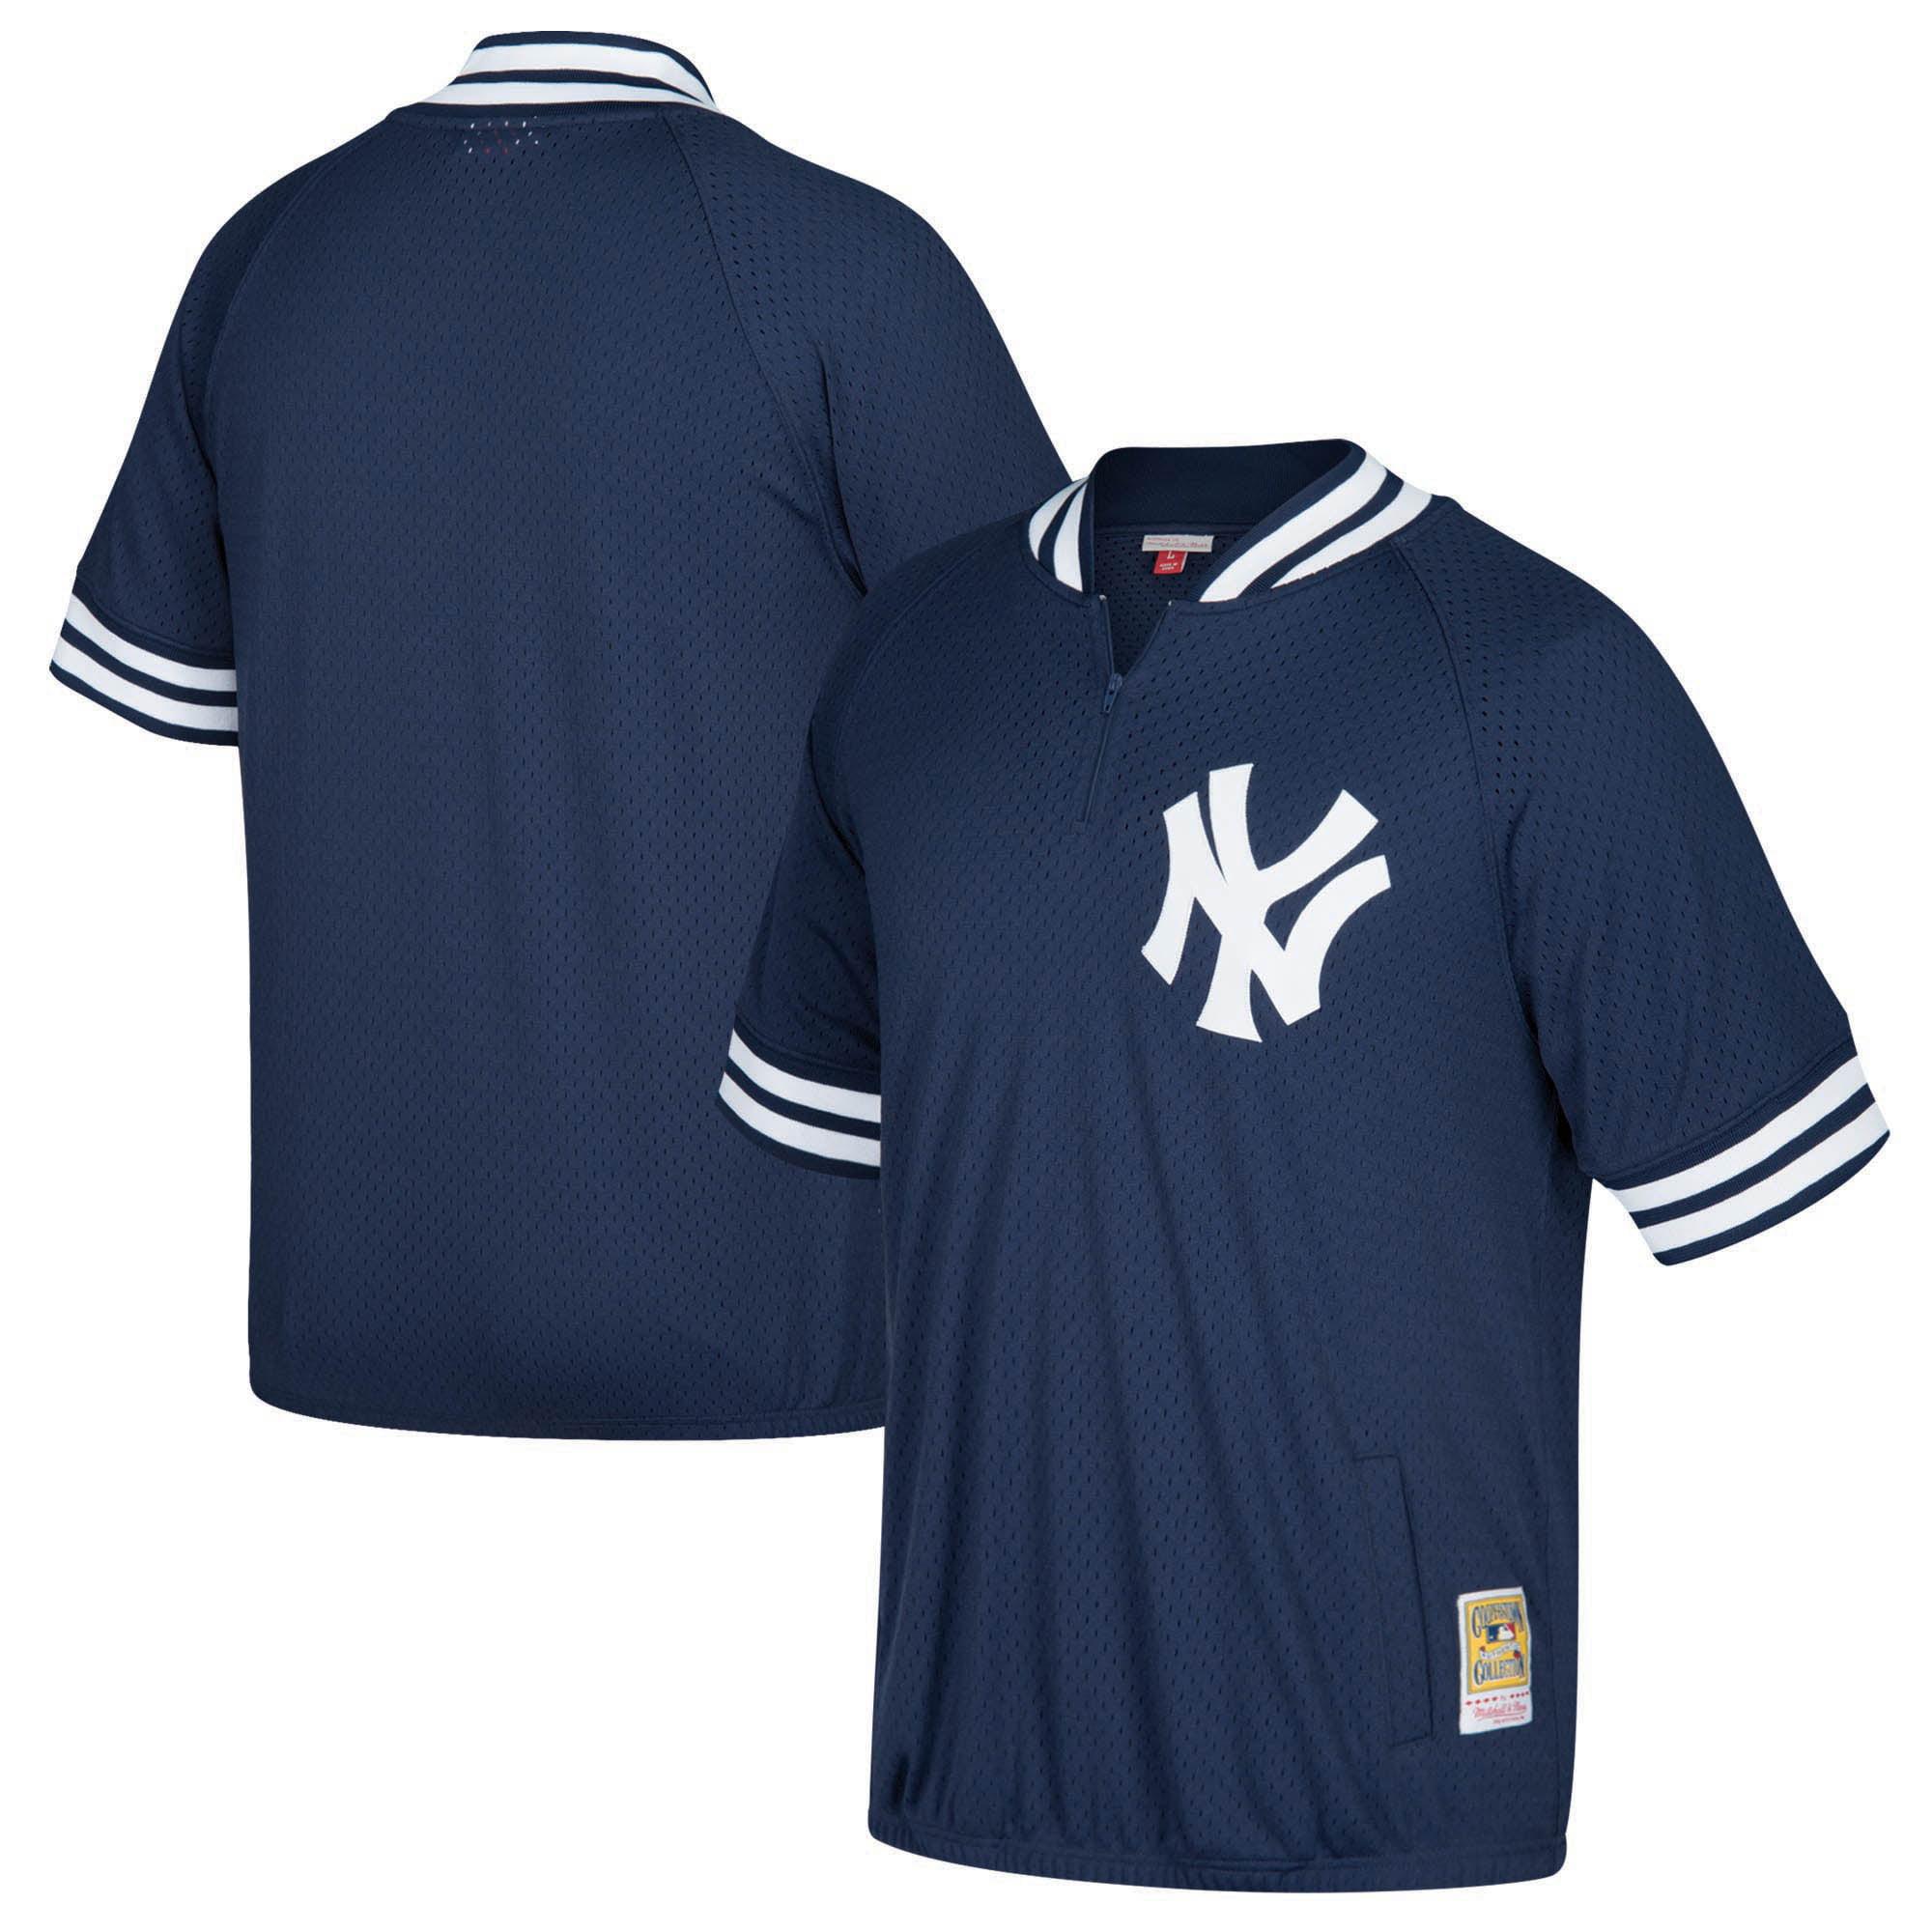 New York Yankees Mitchell & Ness Cooperstown Collection Mesh Batting Practice Quarter-Zip Jersey - Navy